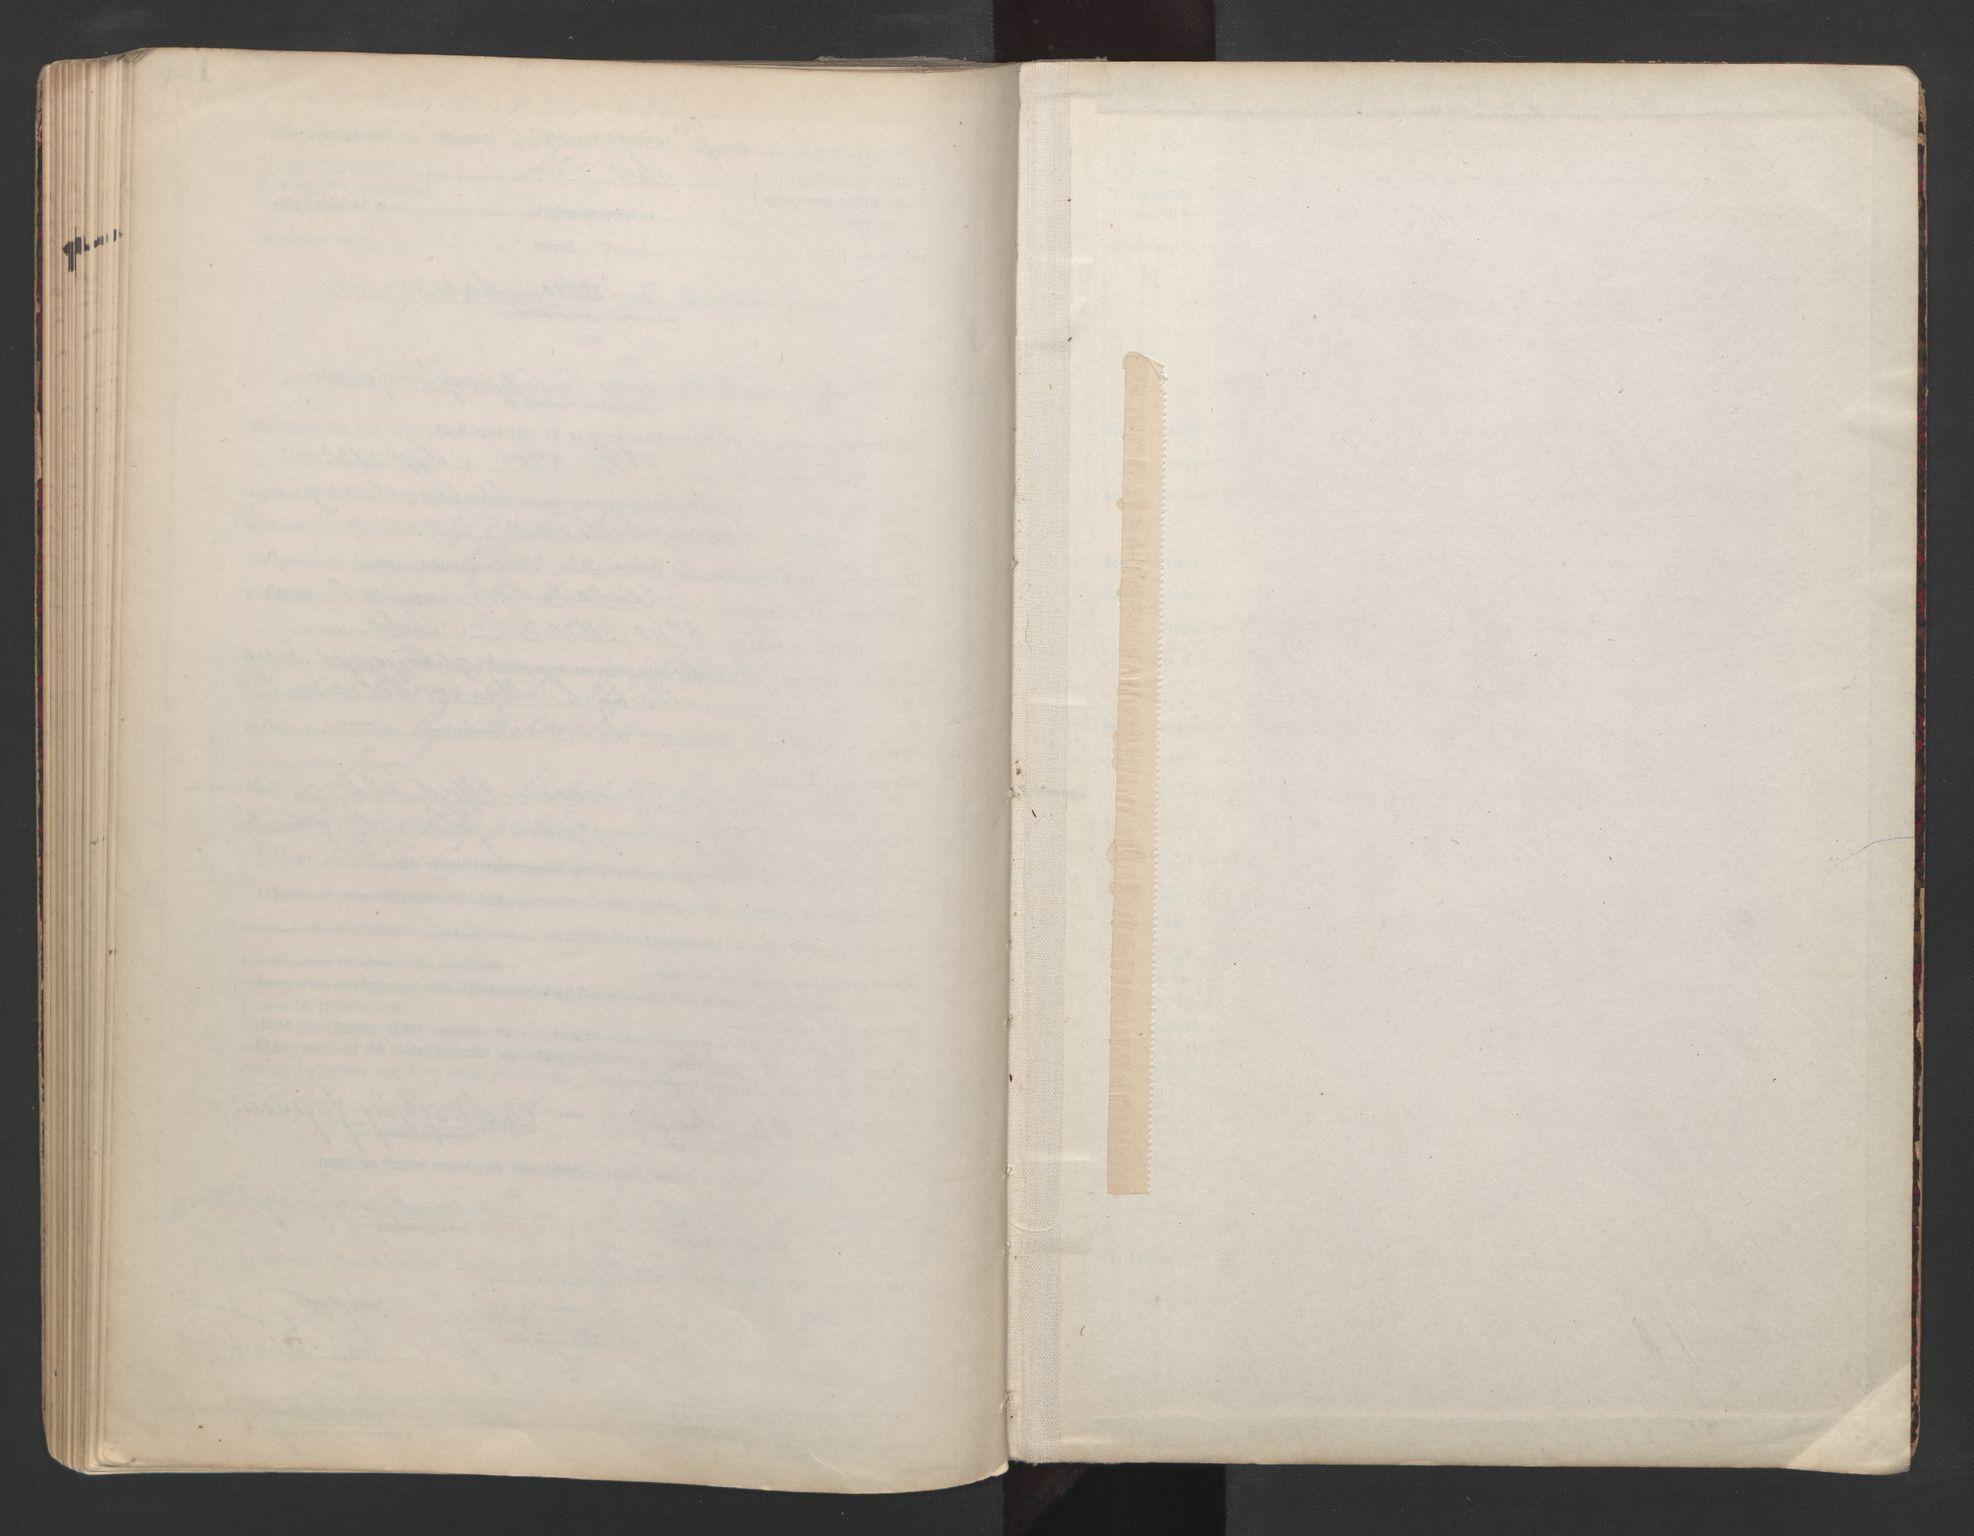 SAO, Aker sorenskriveri, L/Lc/Lcb/L0005: Vigselprotokoll, 1929-1931, s. upaginert